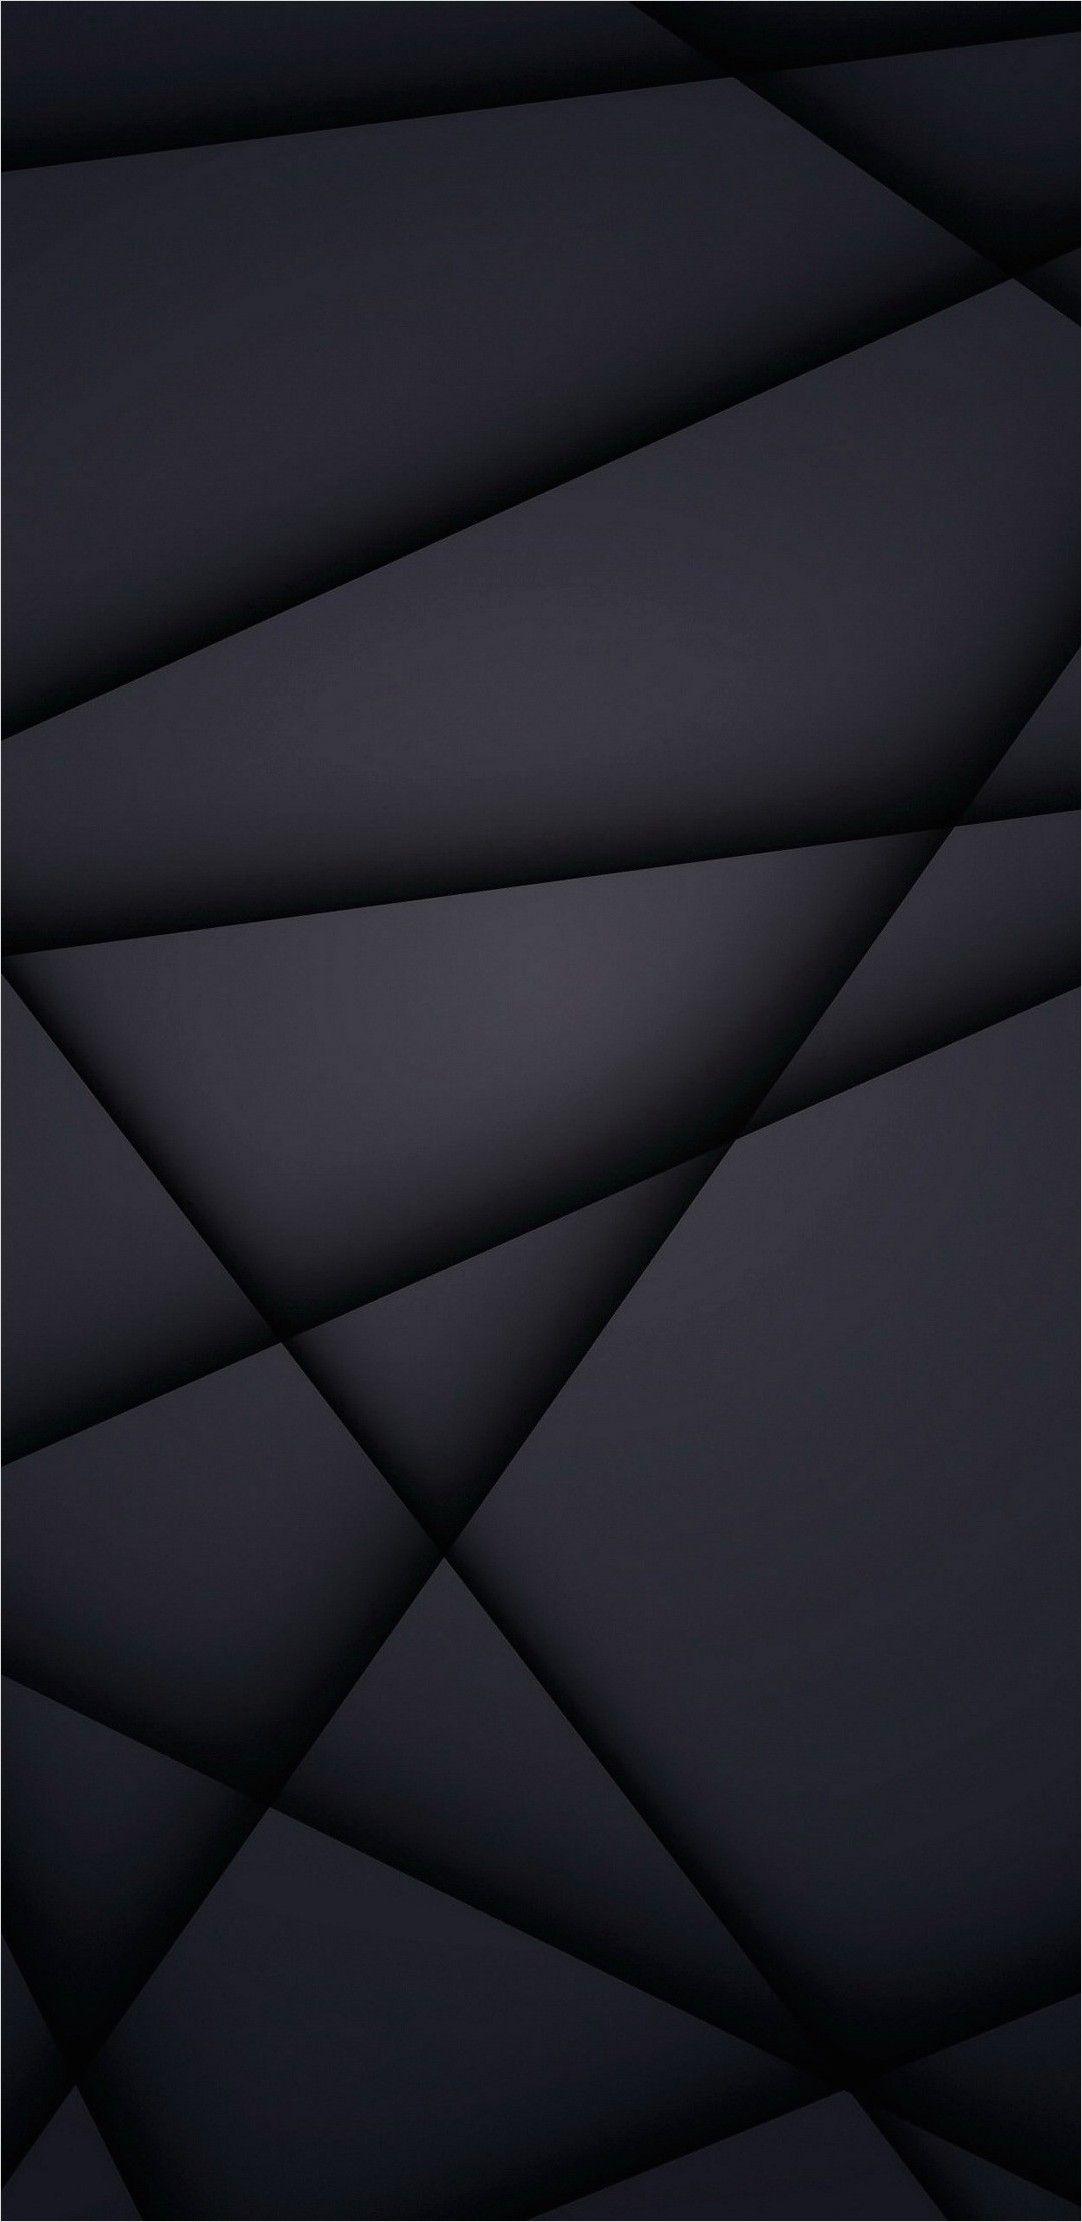 1080 X 2220 4k Wallpaper In 2020 Background Hd Wallpaper Hd Wallpaper Dark Wallpaper